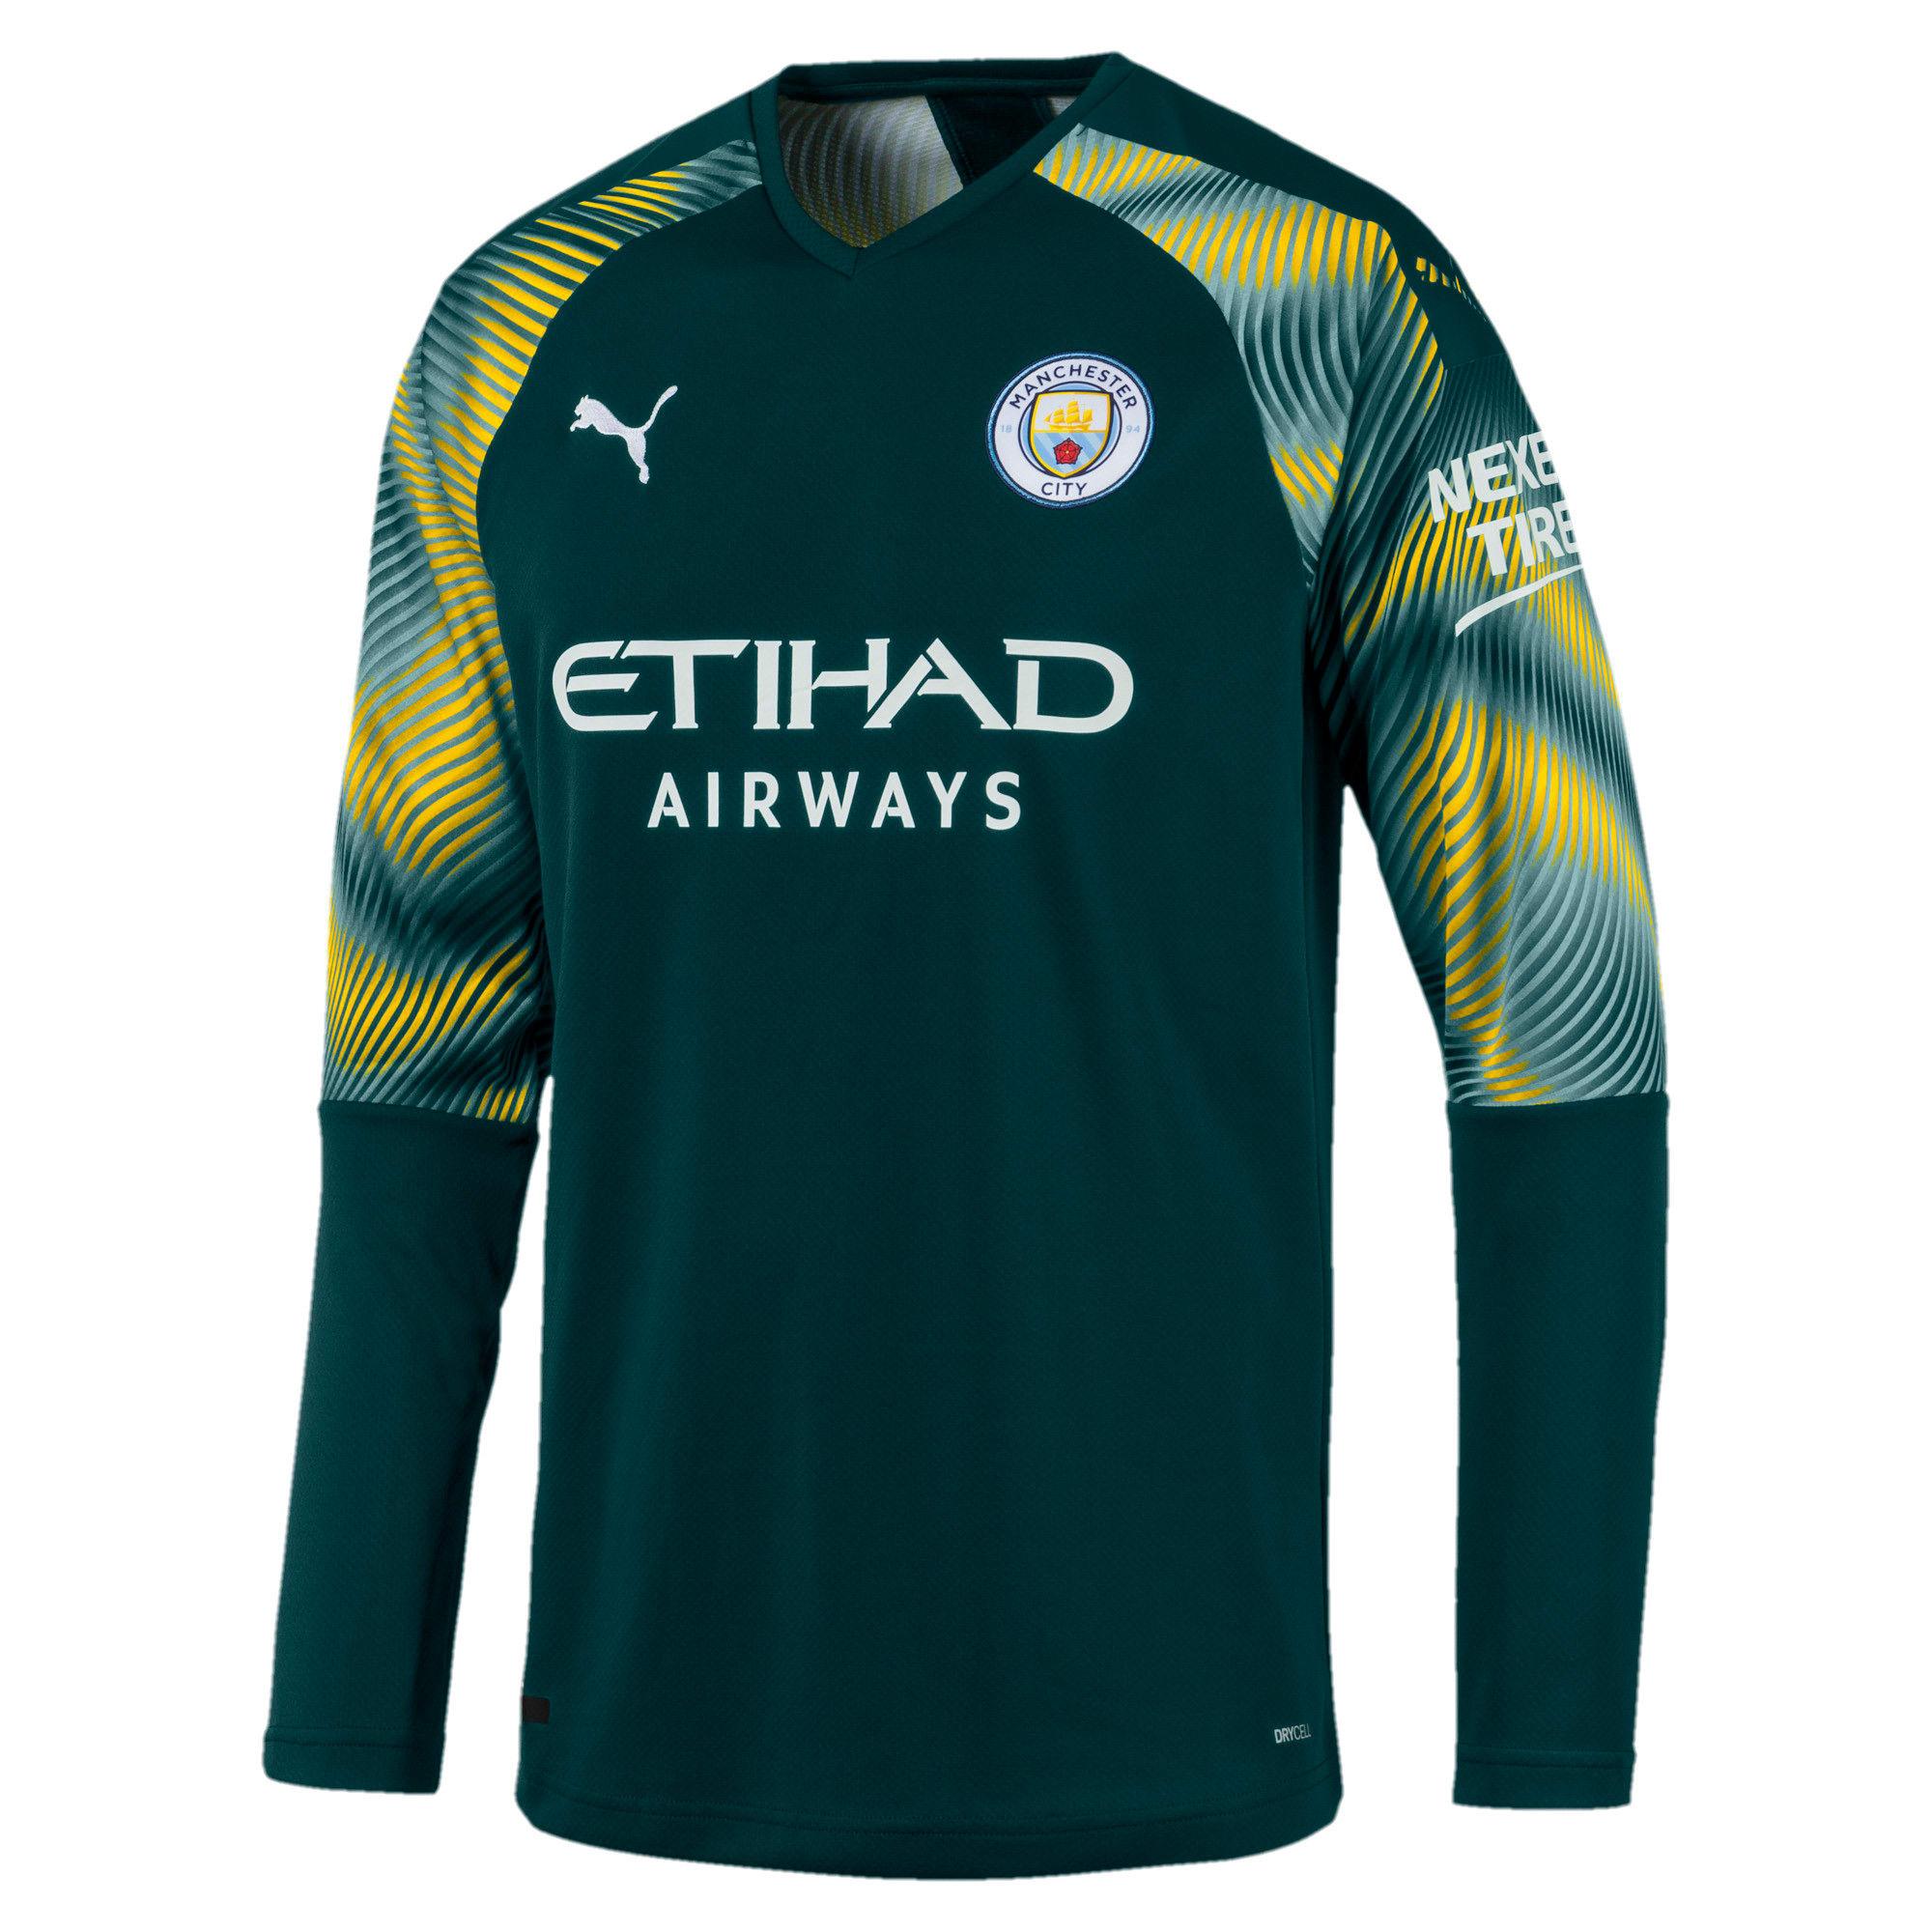 Miniatura 1 de Réplica de camiseta de arquero de Manchester City FC para hombre, Ponderosa Pine-Cyber Yellow, mediano